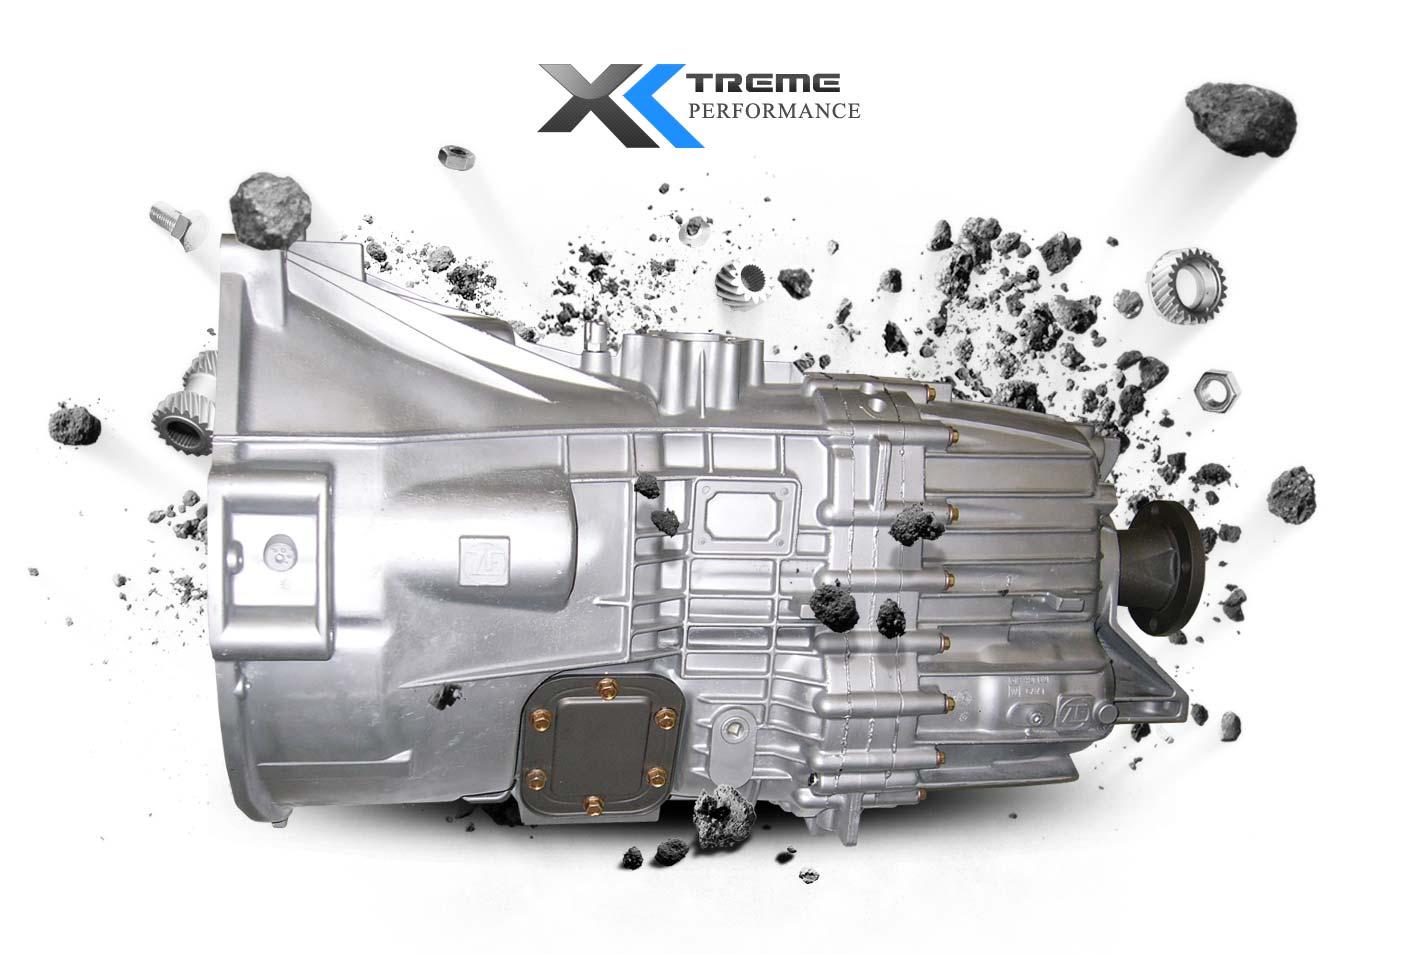 Fmx Transmission Wiring Diagram Ford Forum Tools